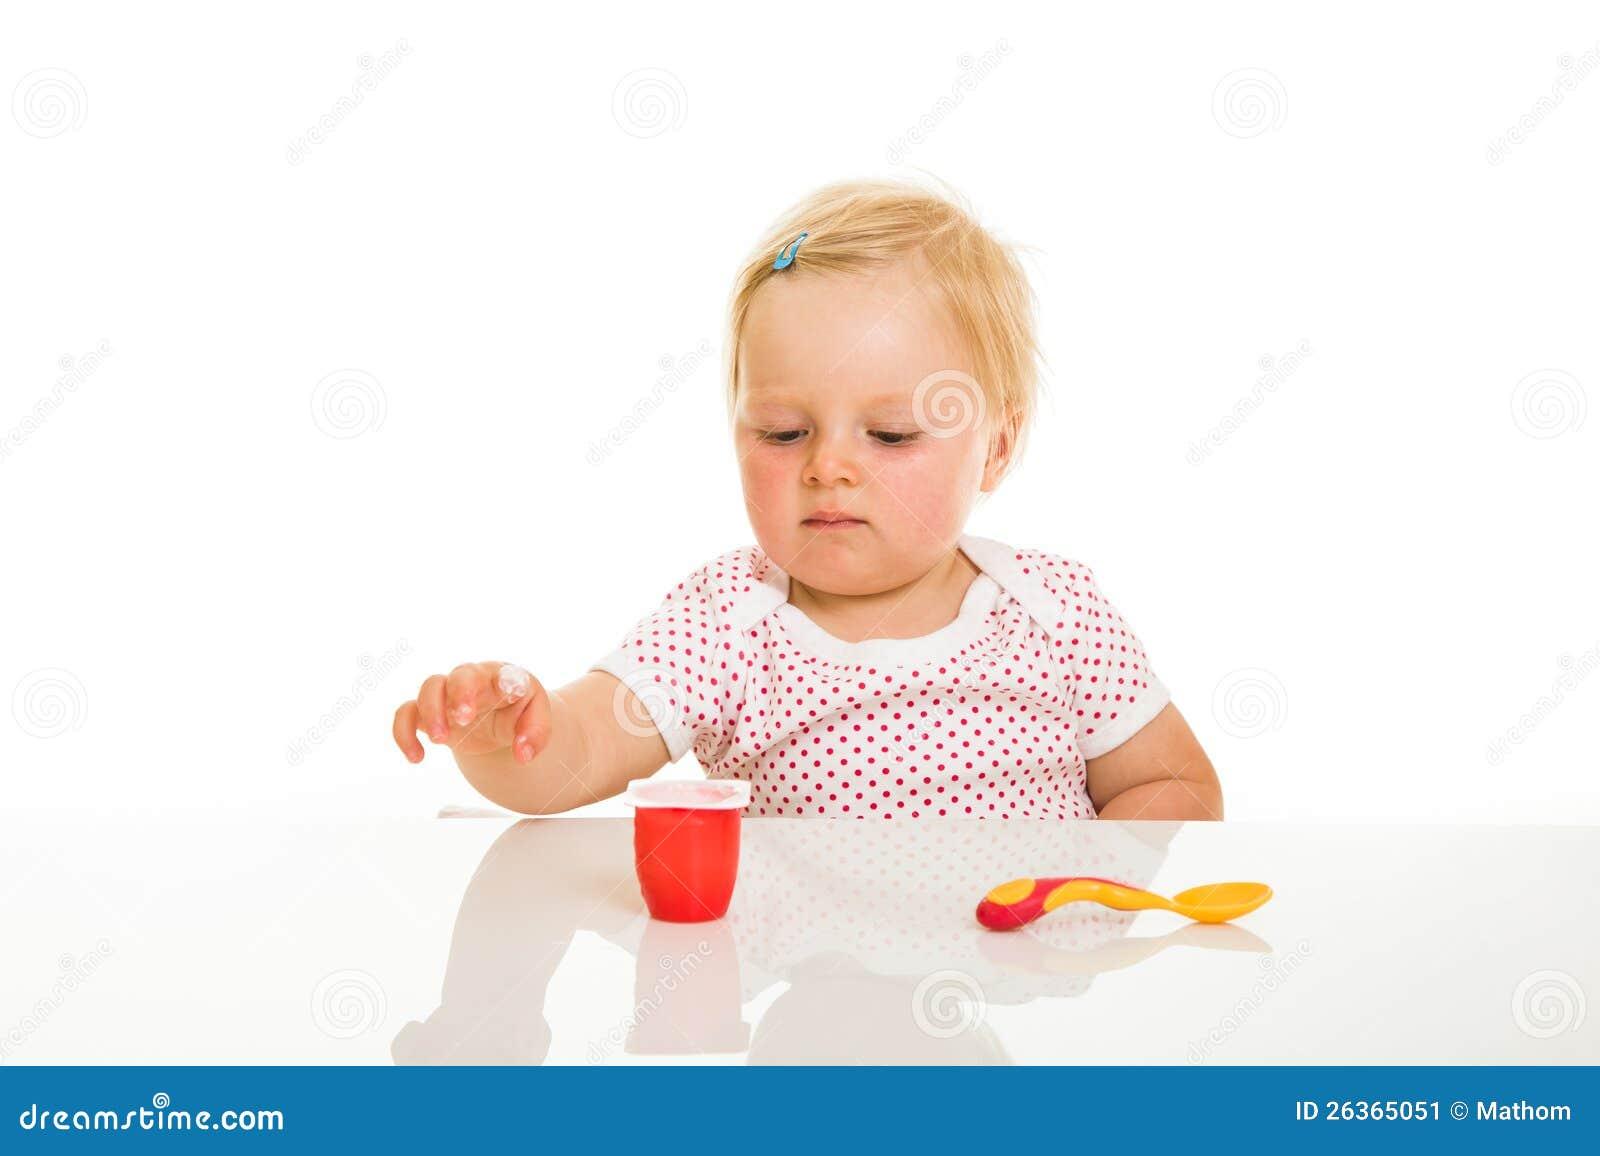 Nettes Säuglingsmädchen, das learining ist, um zu essen